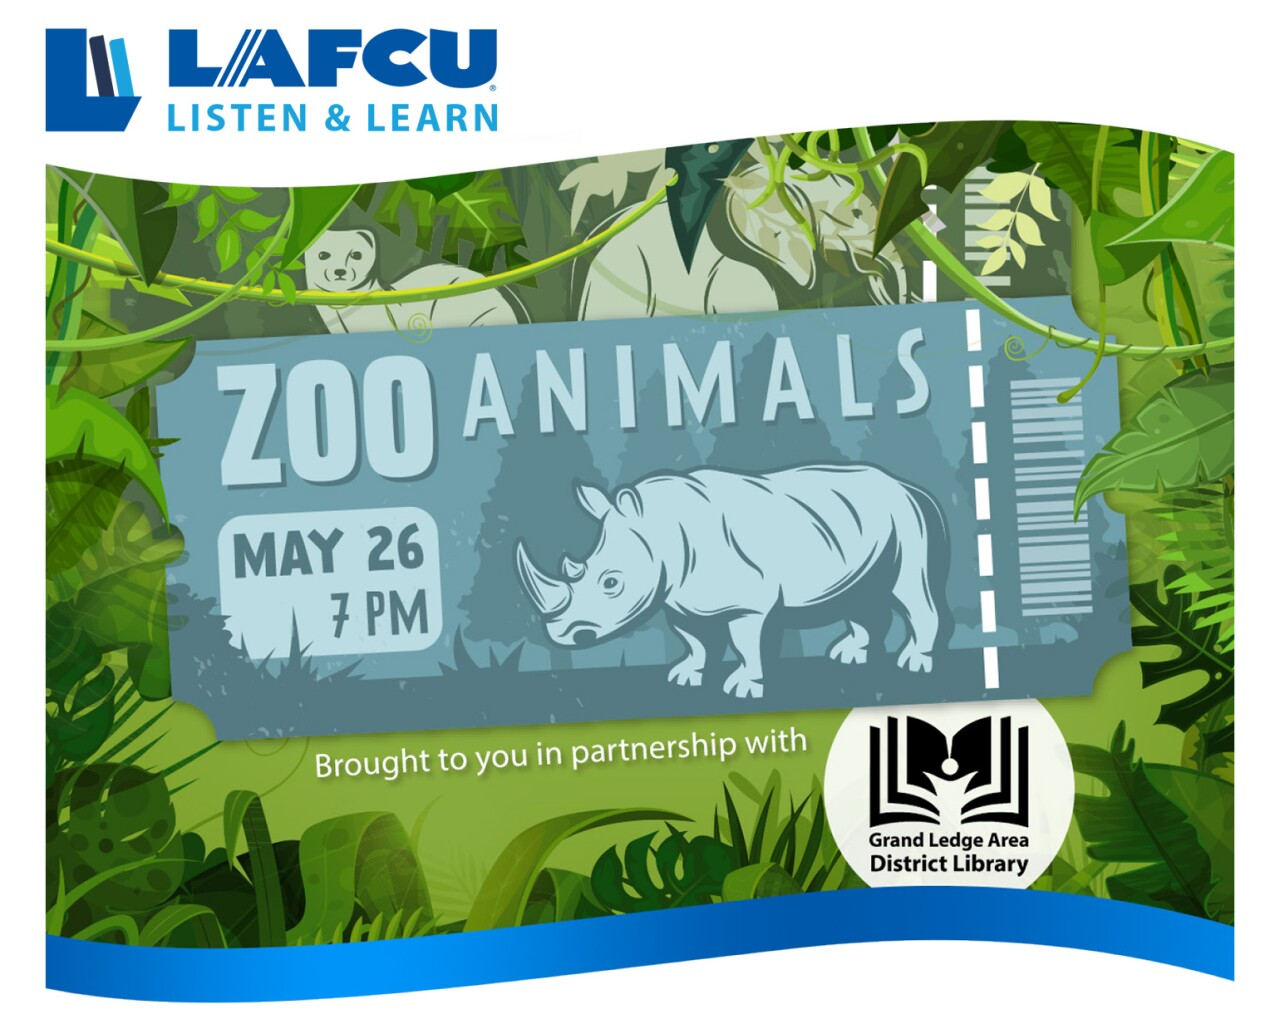 LAFCU Listen & Learn Zoo Animals